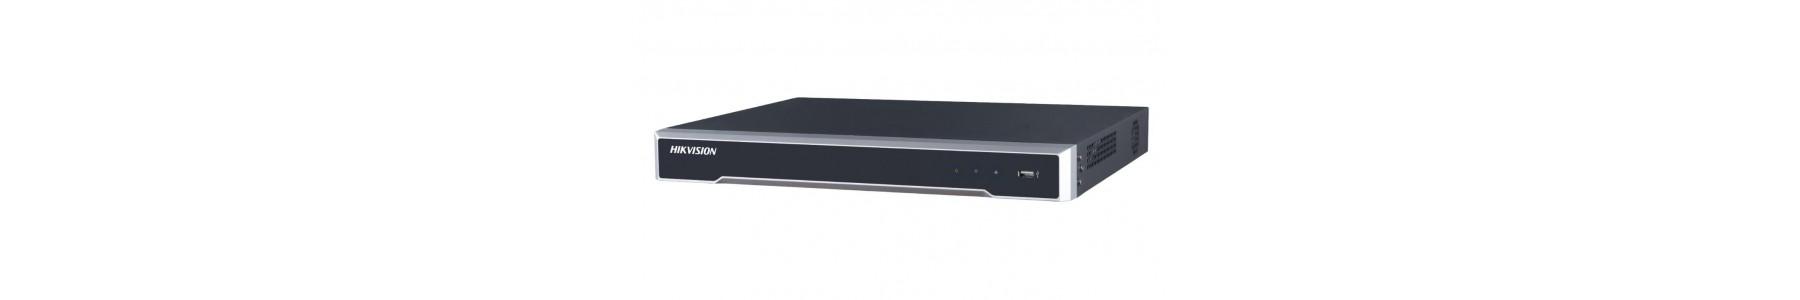 NVR SERIE 7600 I ACUSENSE (HDD Incluso)